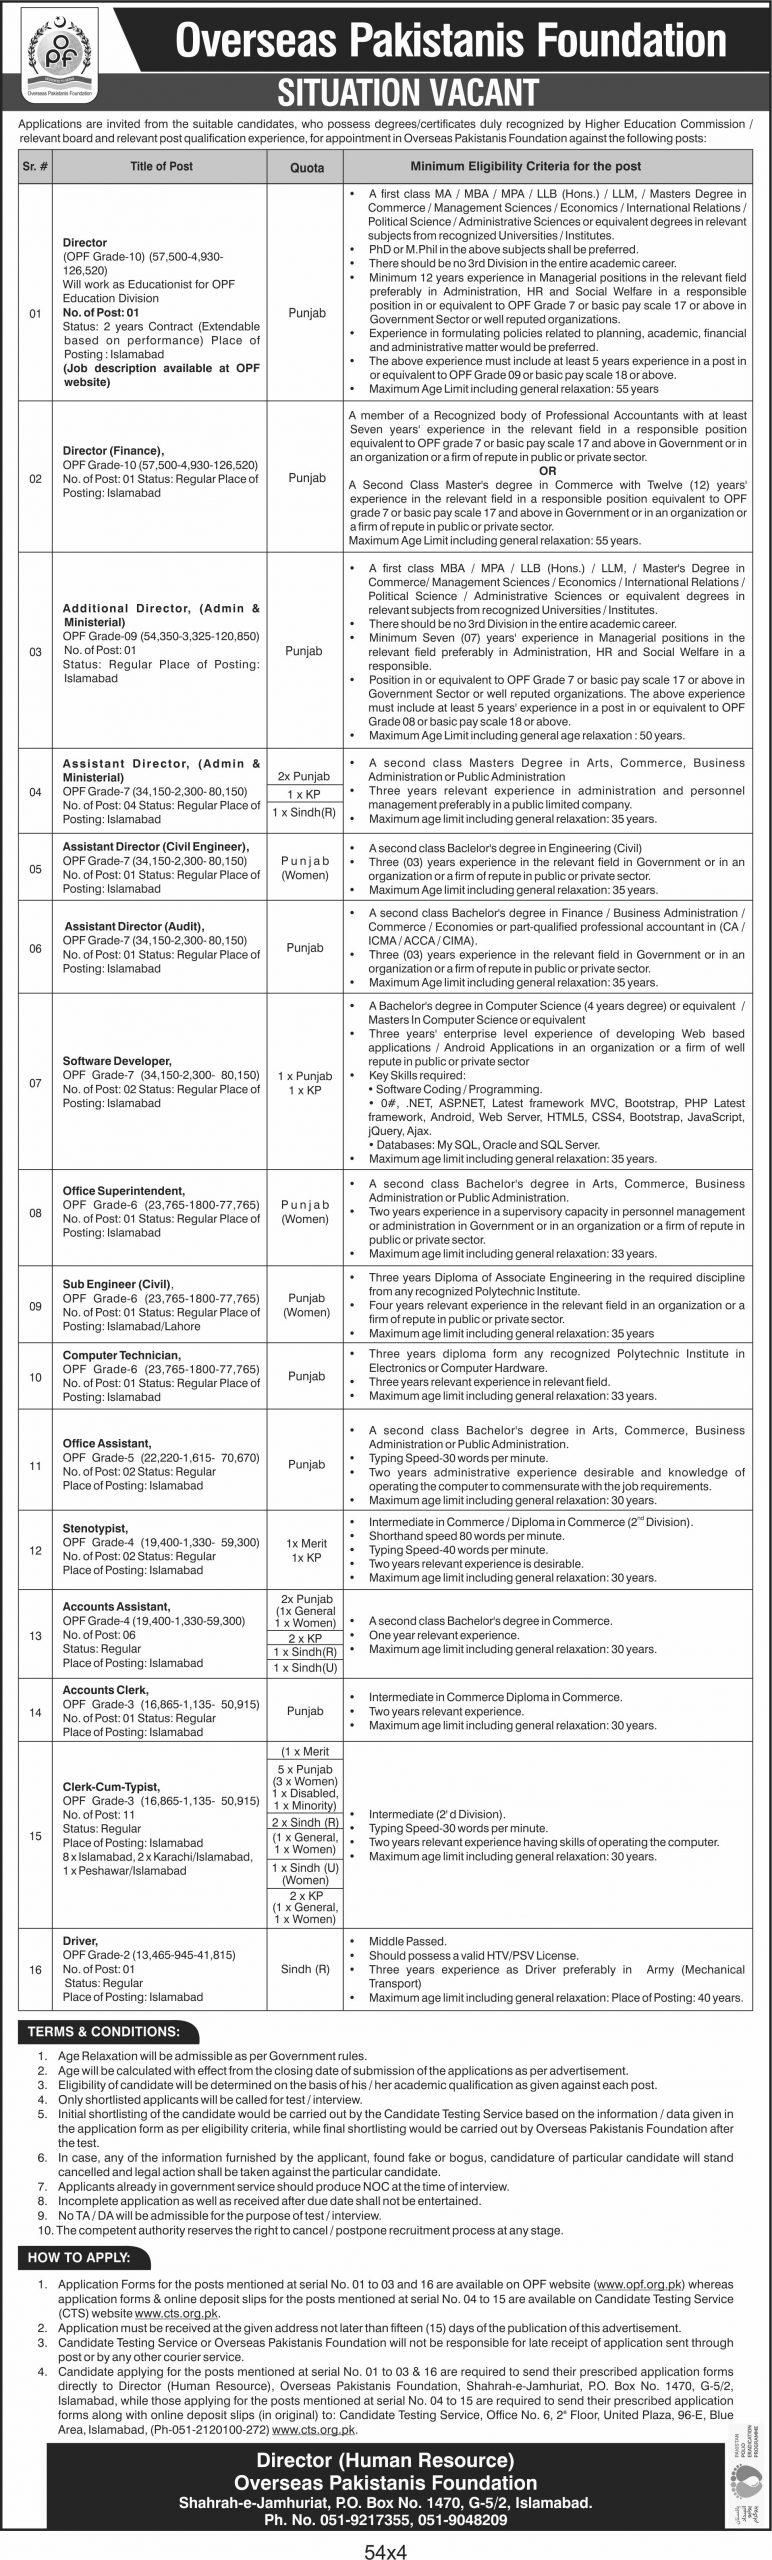 Overseas Pakistanis Foundation OPF Jobs 2020 CTS Application Form Roll No Slip